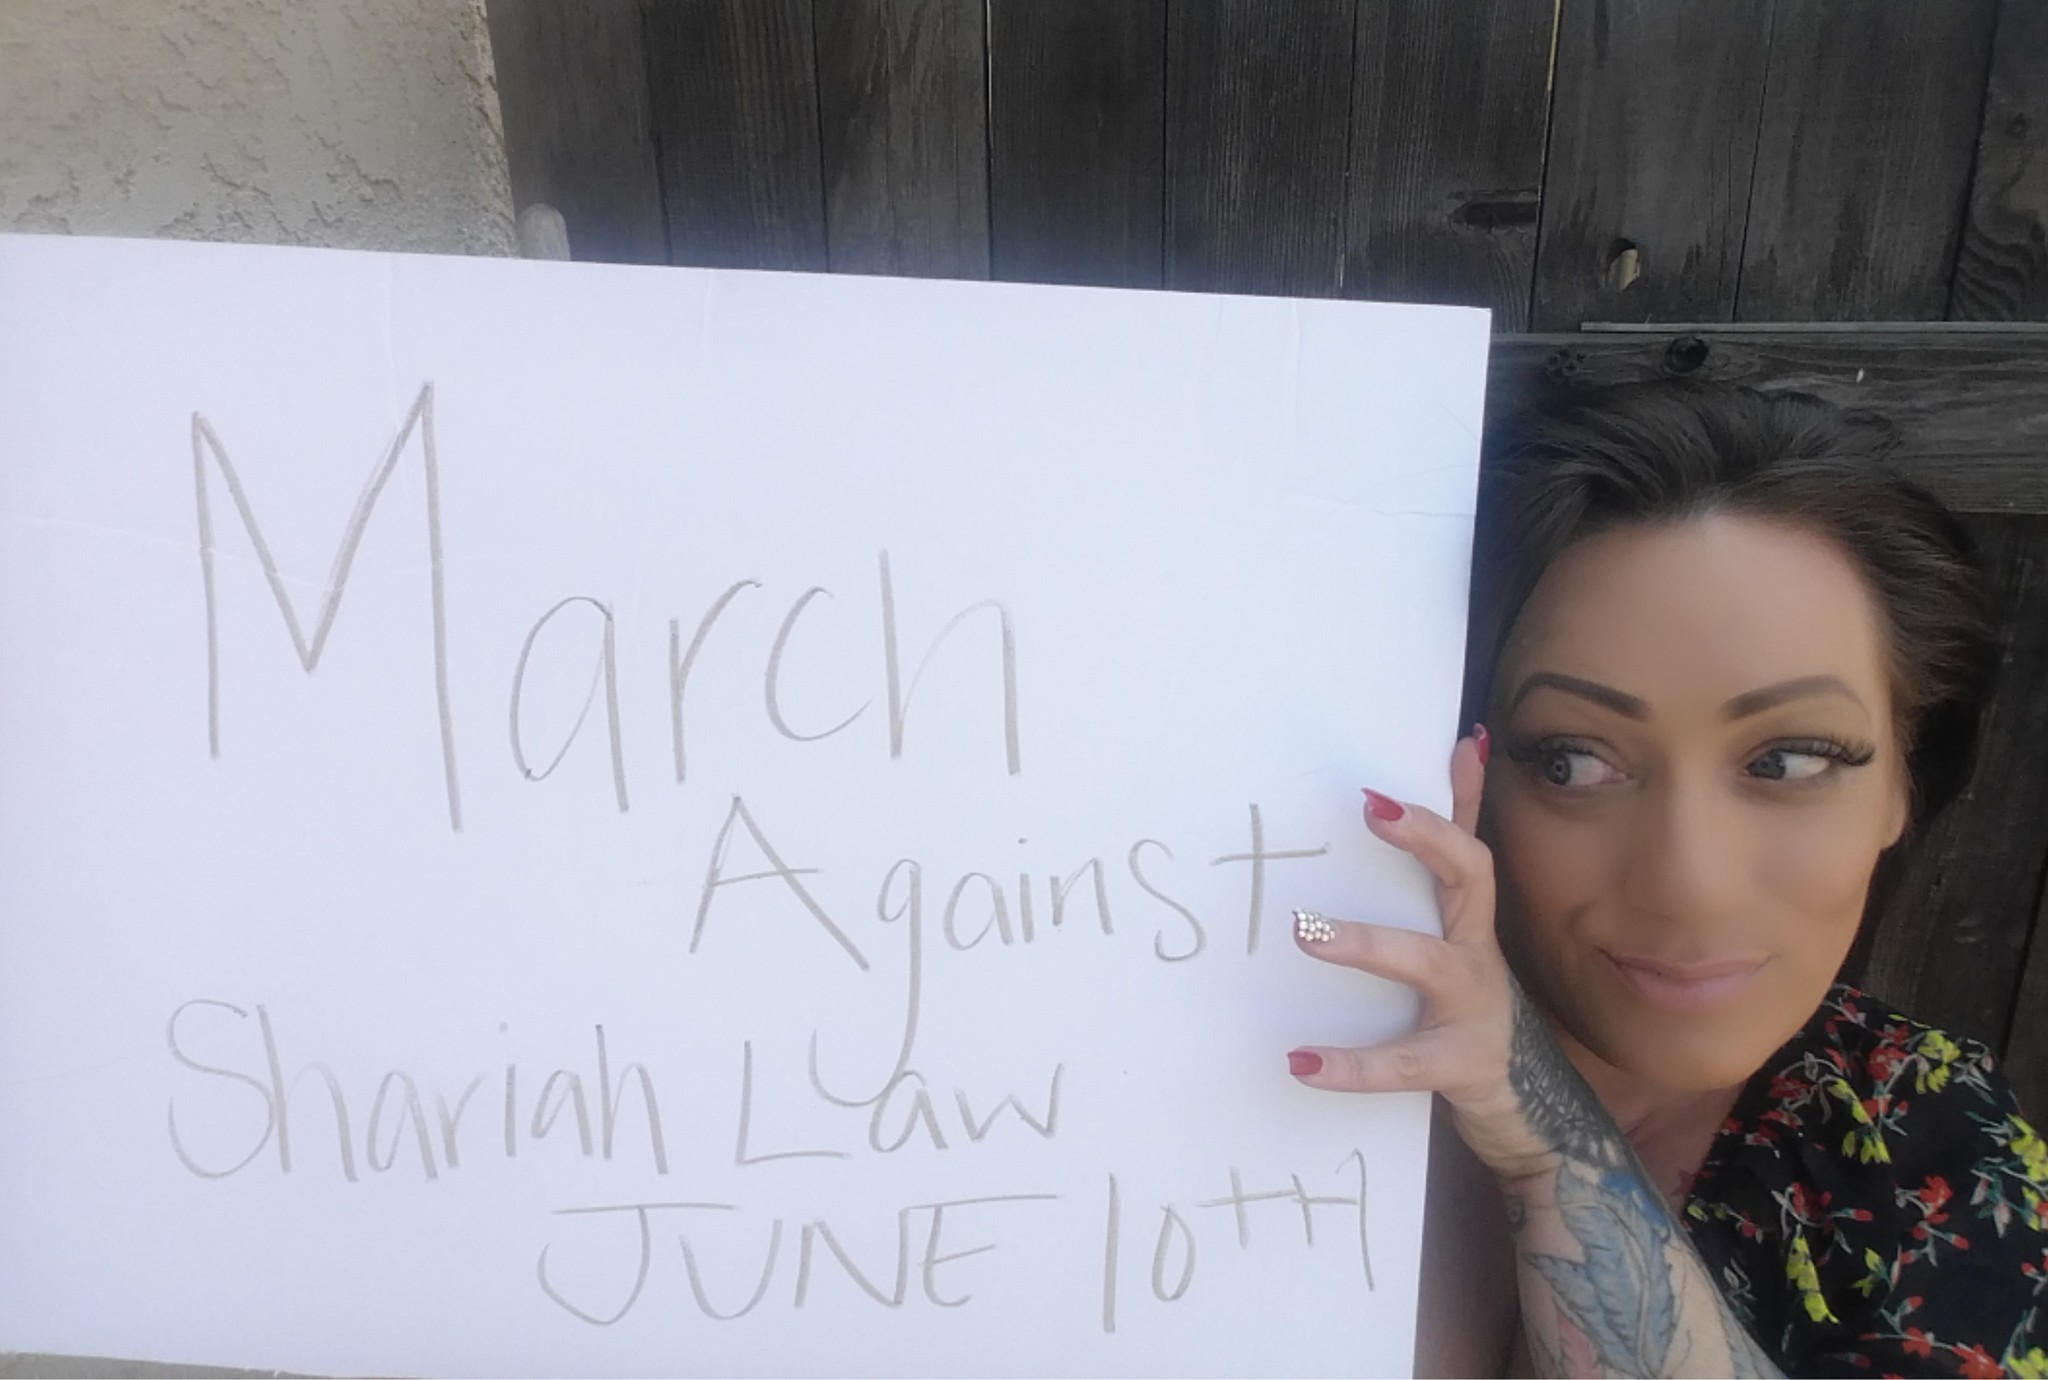 MarchAgainstSharia22.jpg